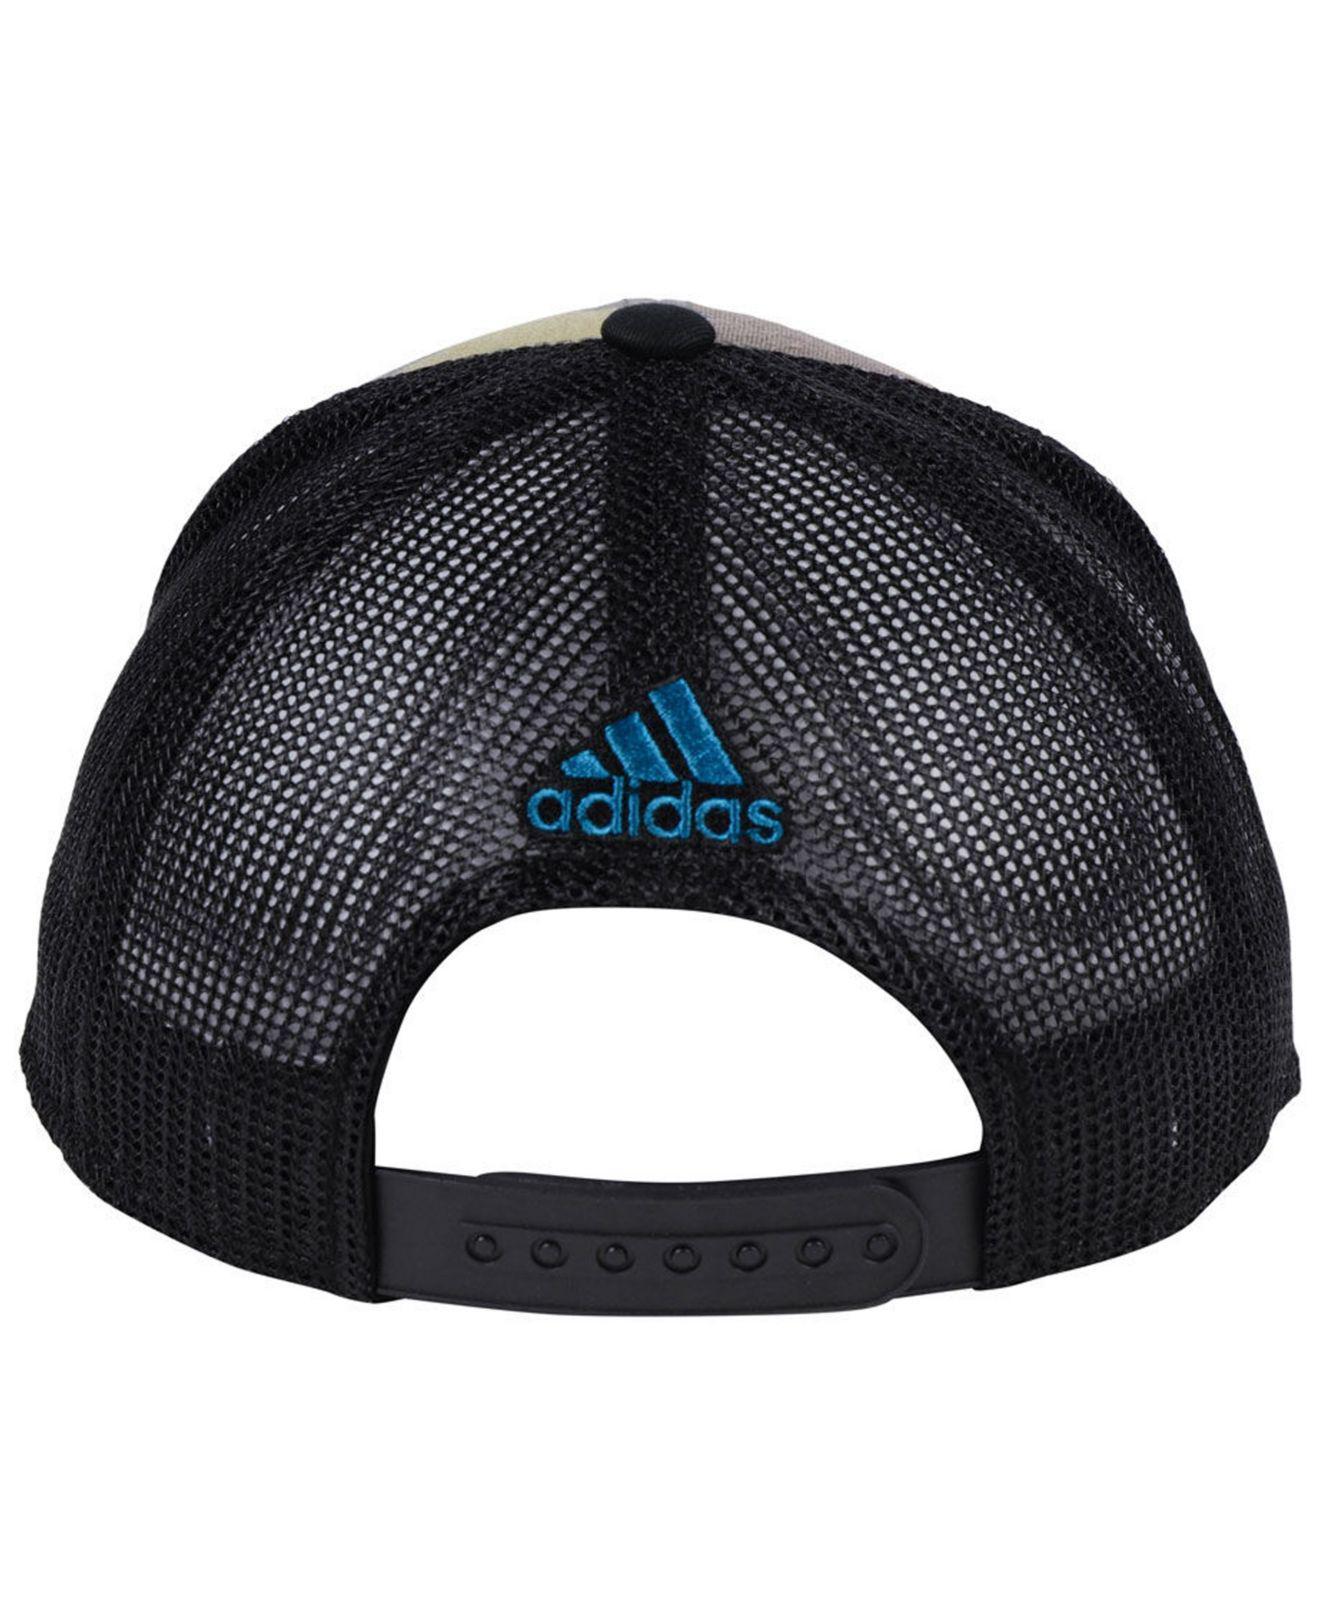 separation shoes 07d3c 0634a adidas San Jose Sharks Camo Trucker Cap in Black for Men - Lyst